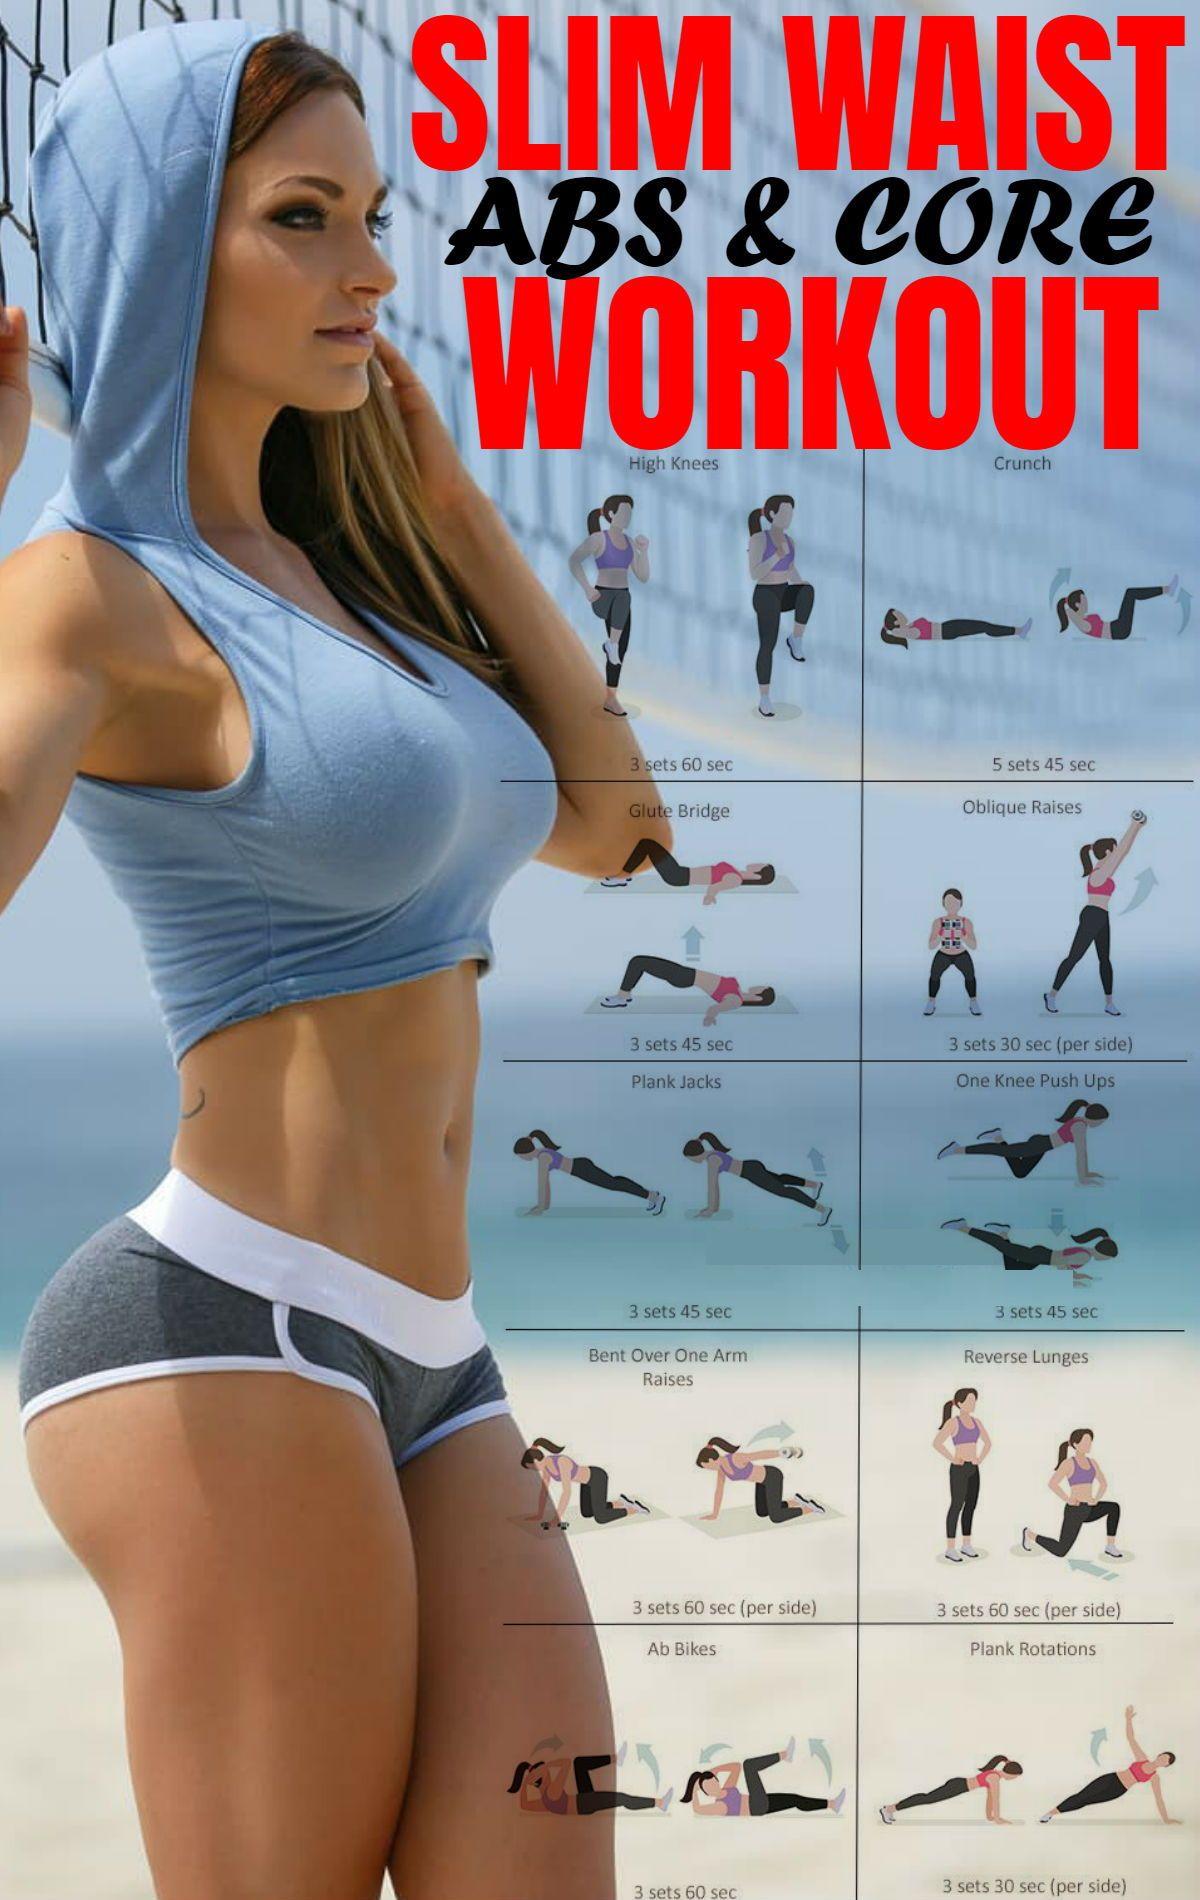 Slim body фитнес, питание, мотивация. Publicaciones | facebook.